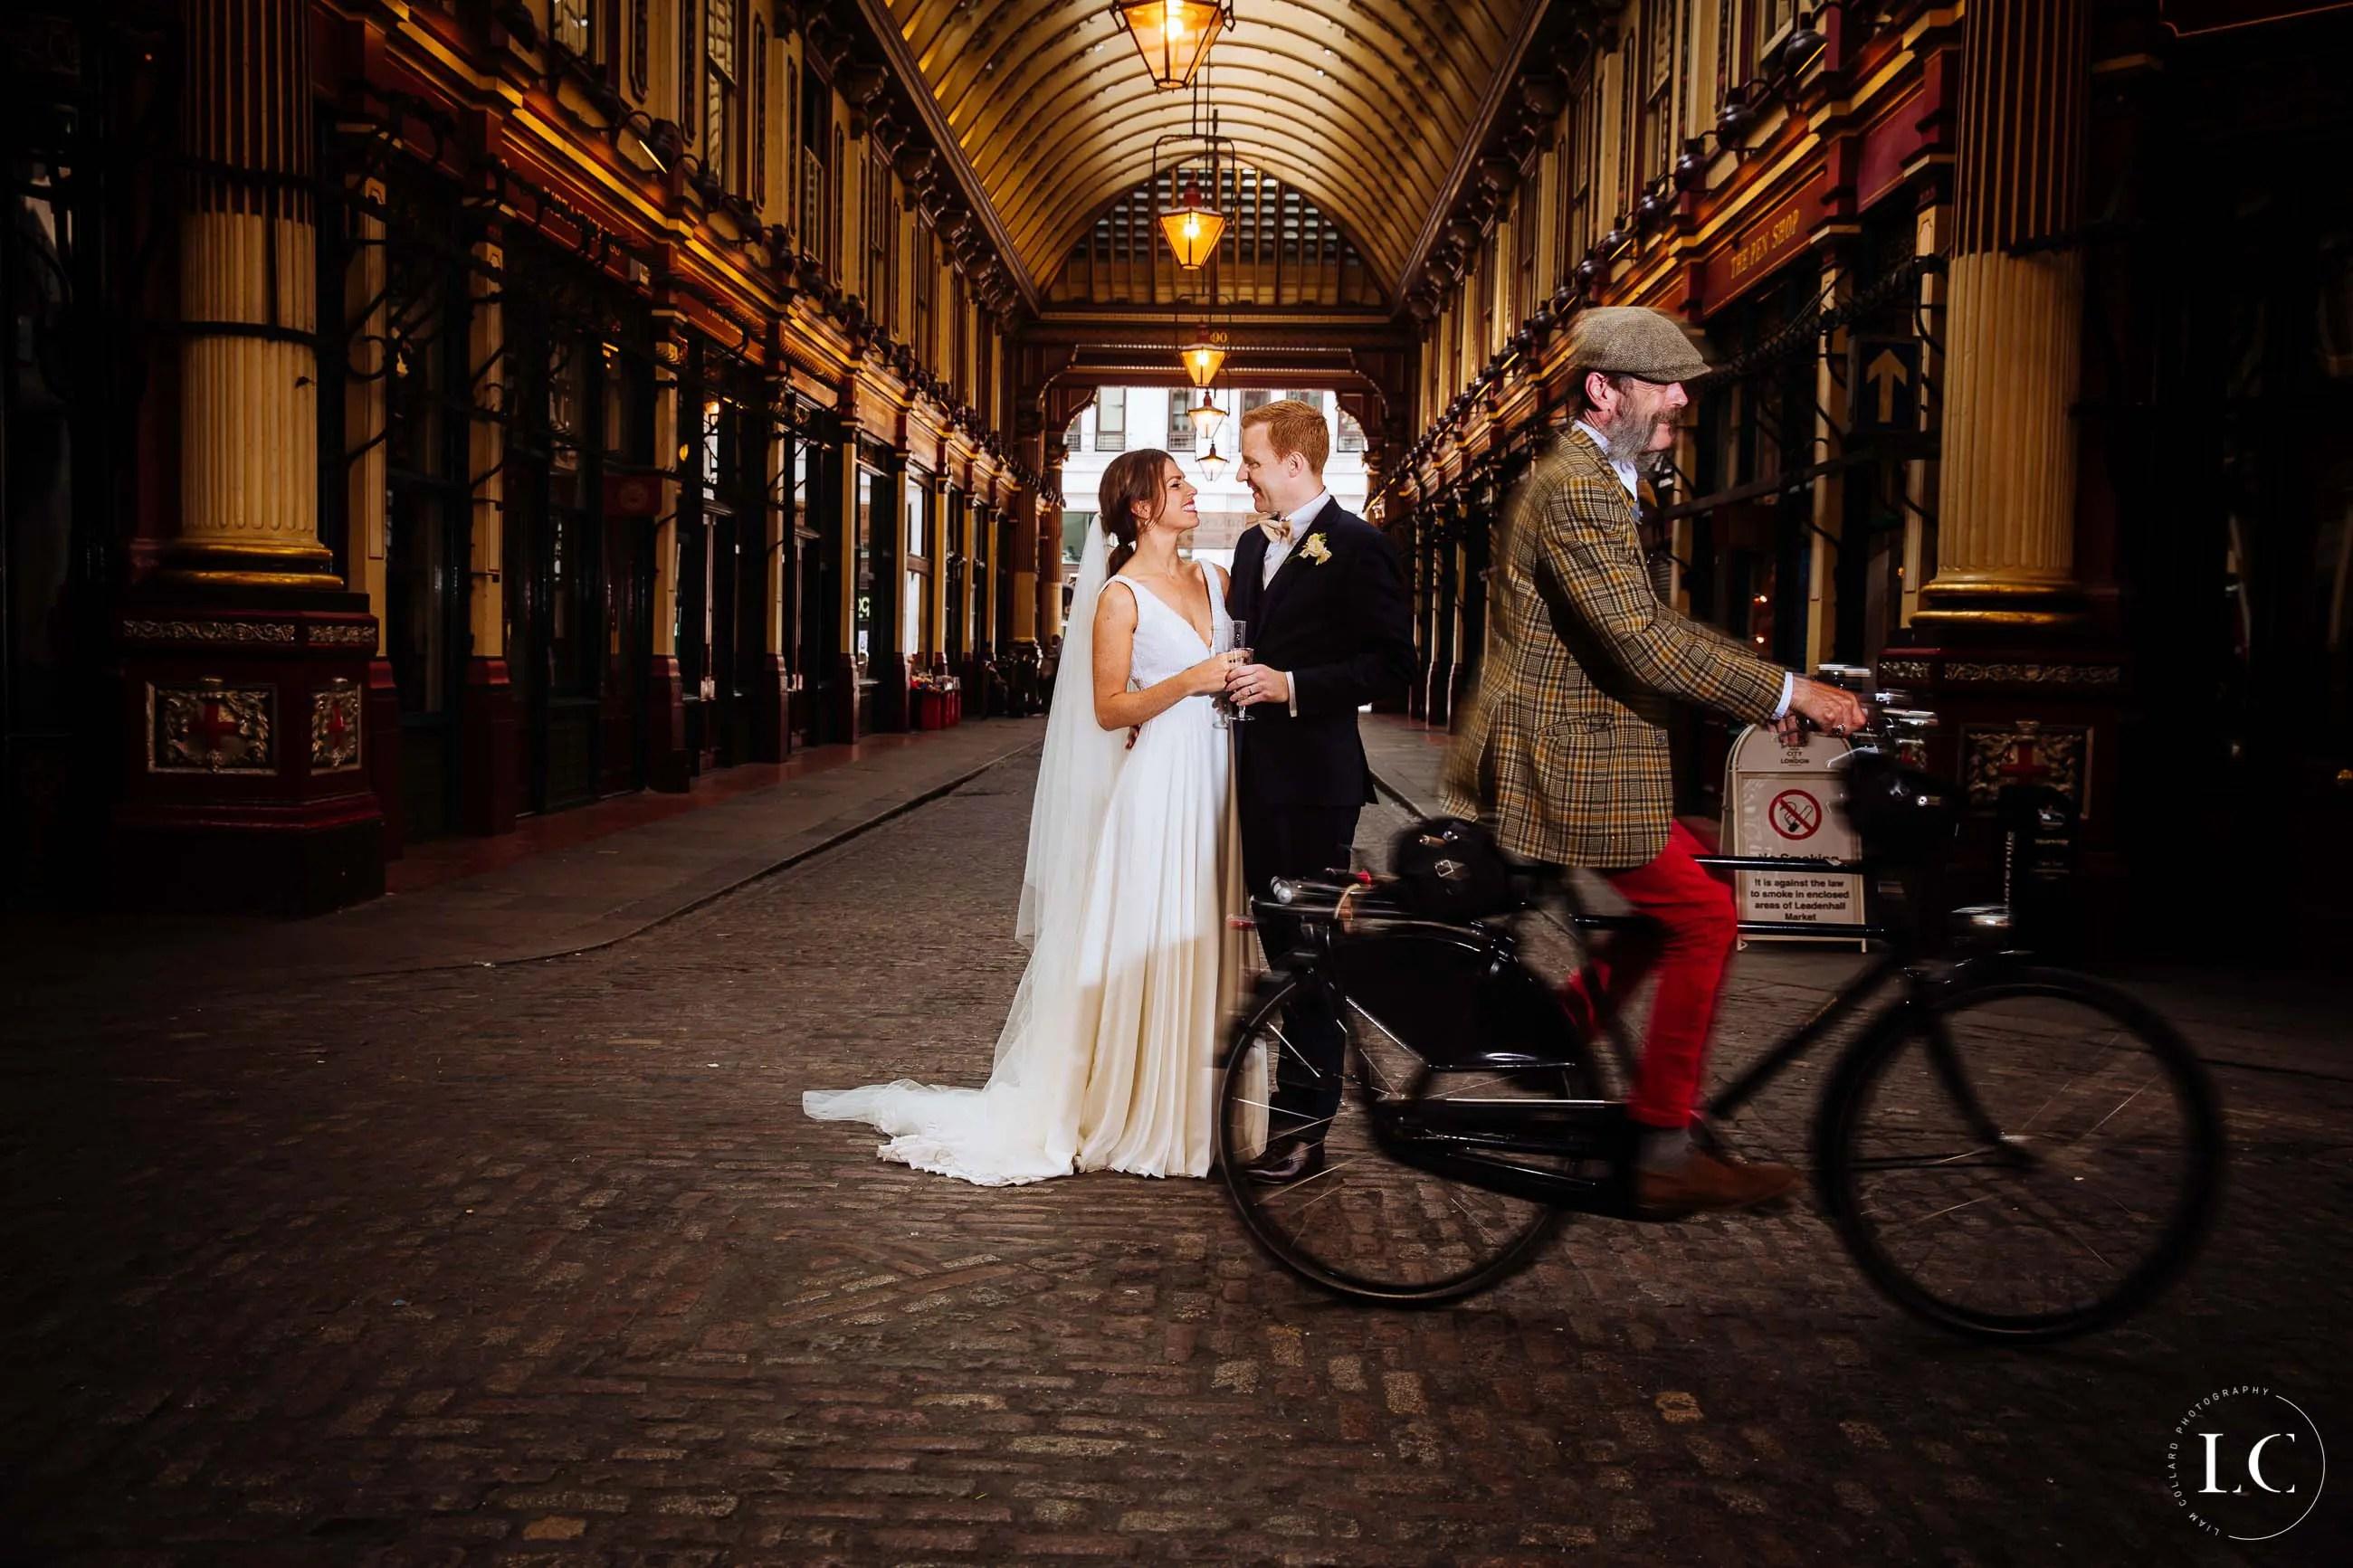 Bride and groom standing in London street